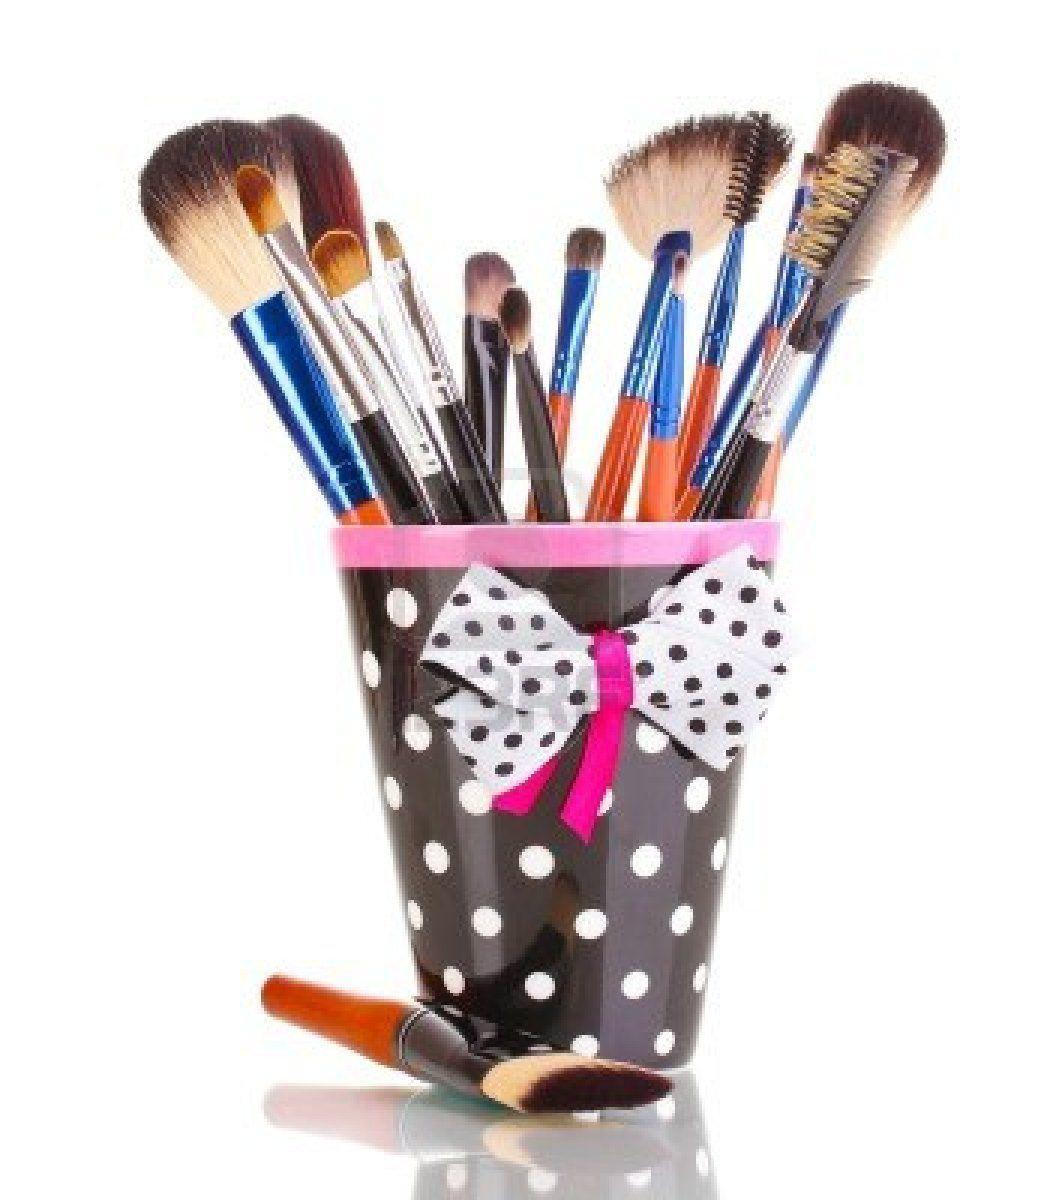 Cute polka dot mug for makeup brushes.